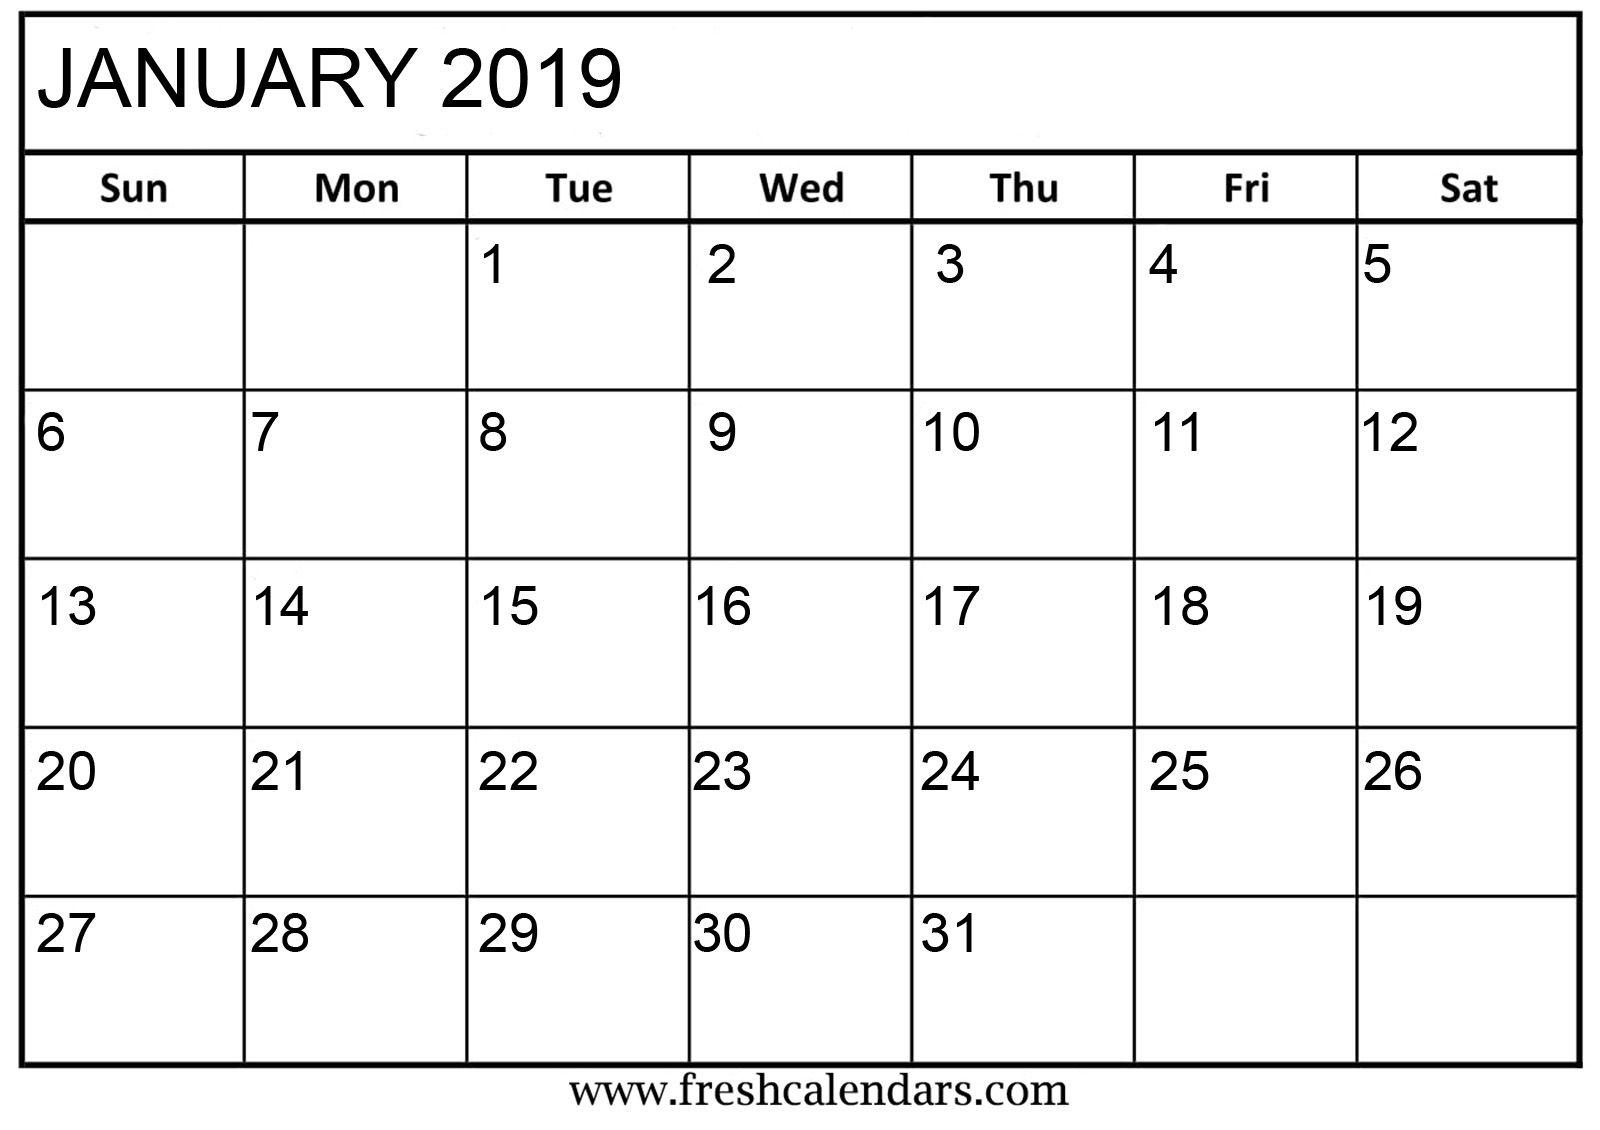 Printable January 2019 Calendar #january2019 #january2019Calendar with January Calendar Printable Template With Holidays